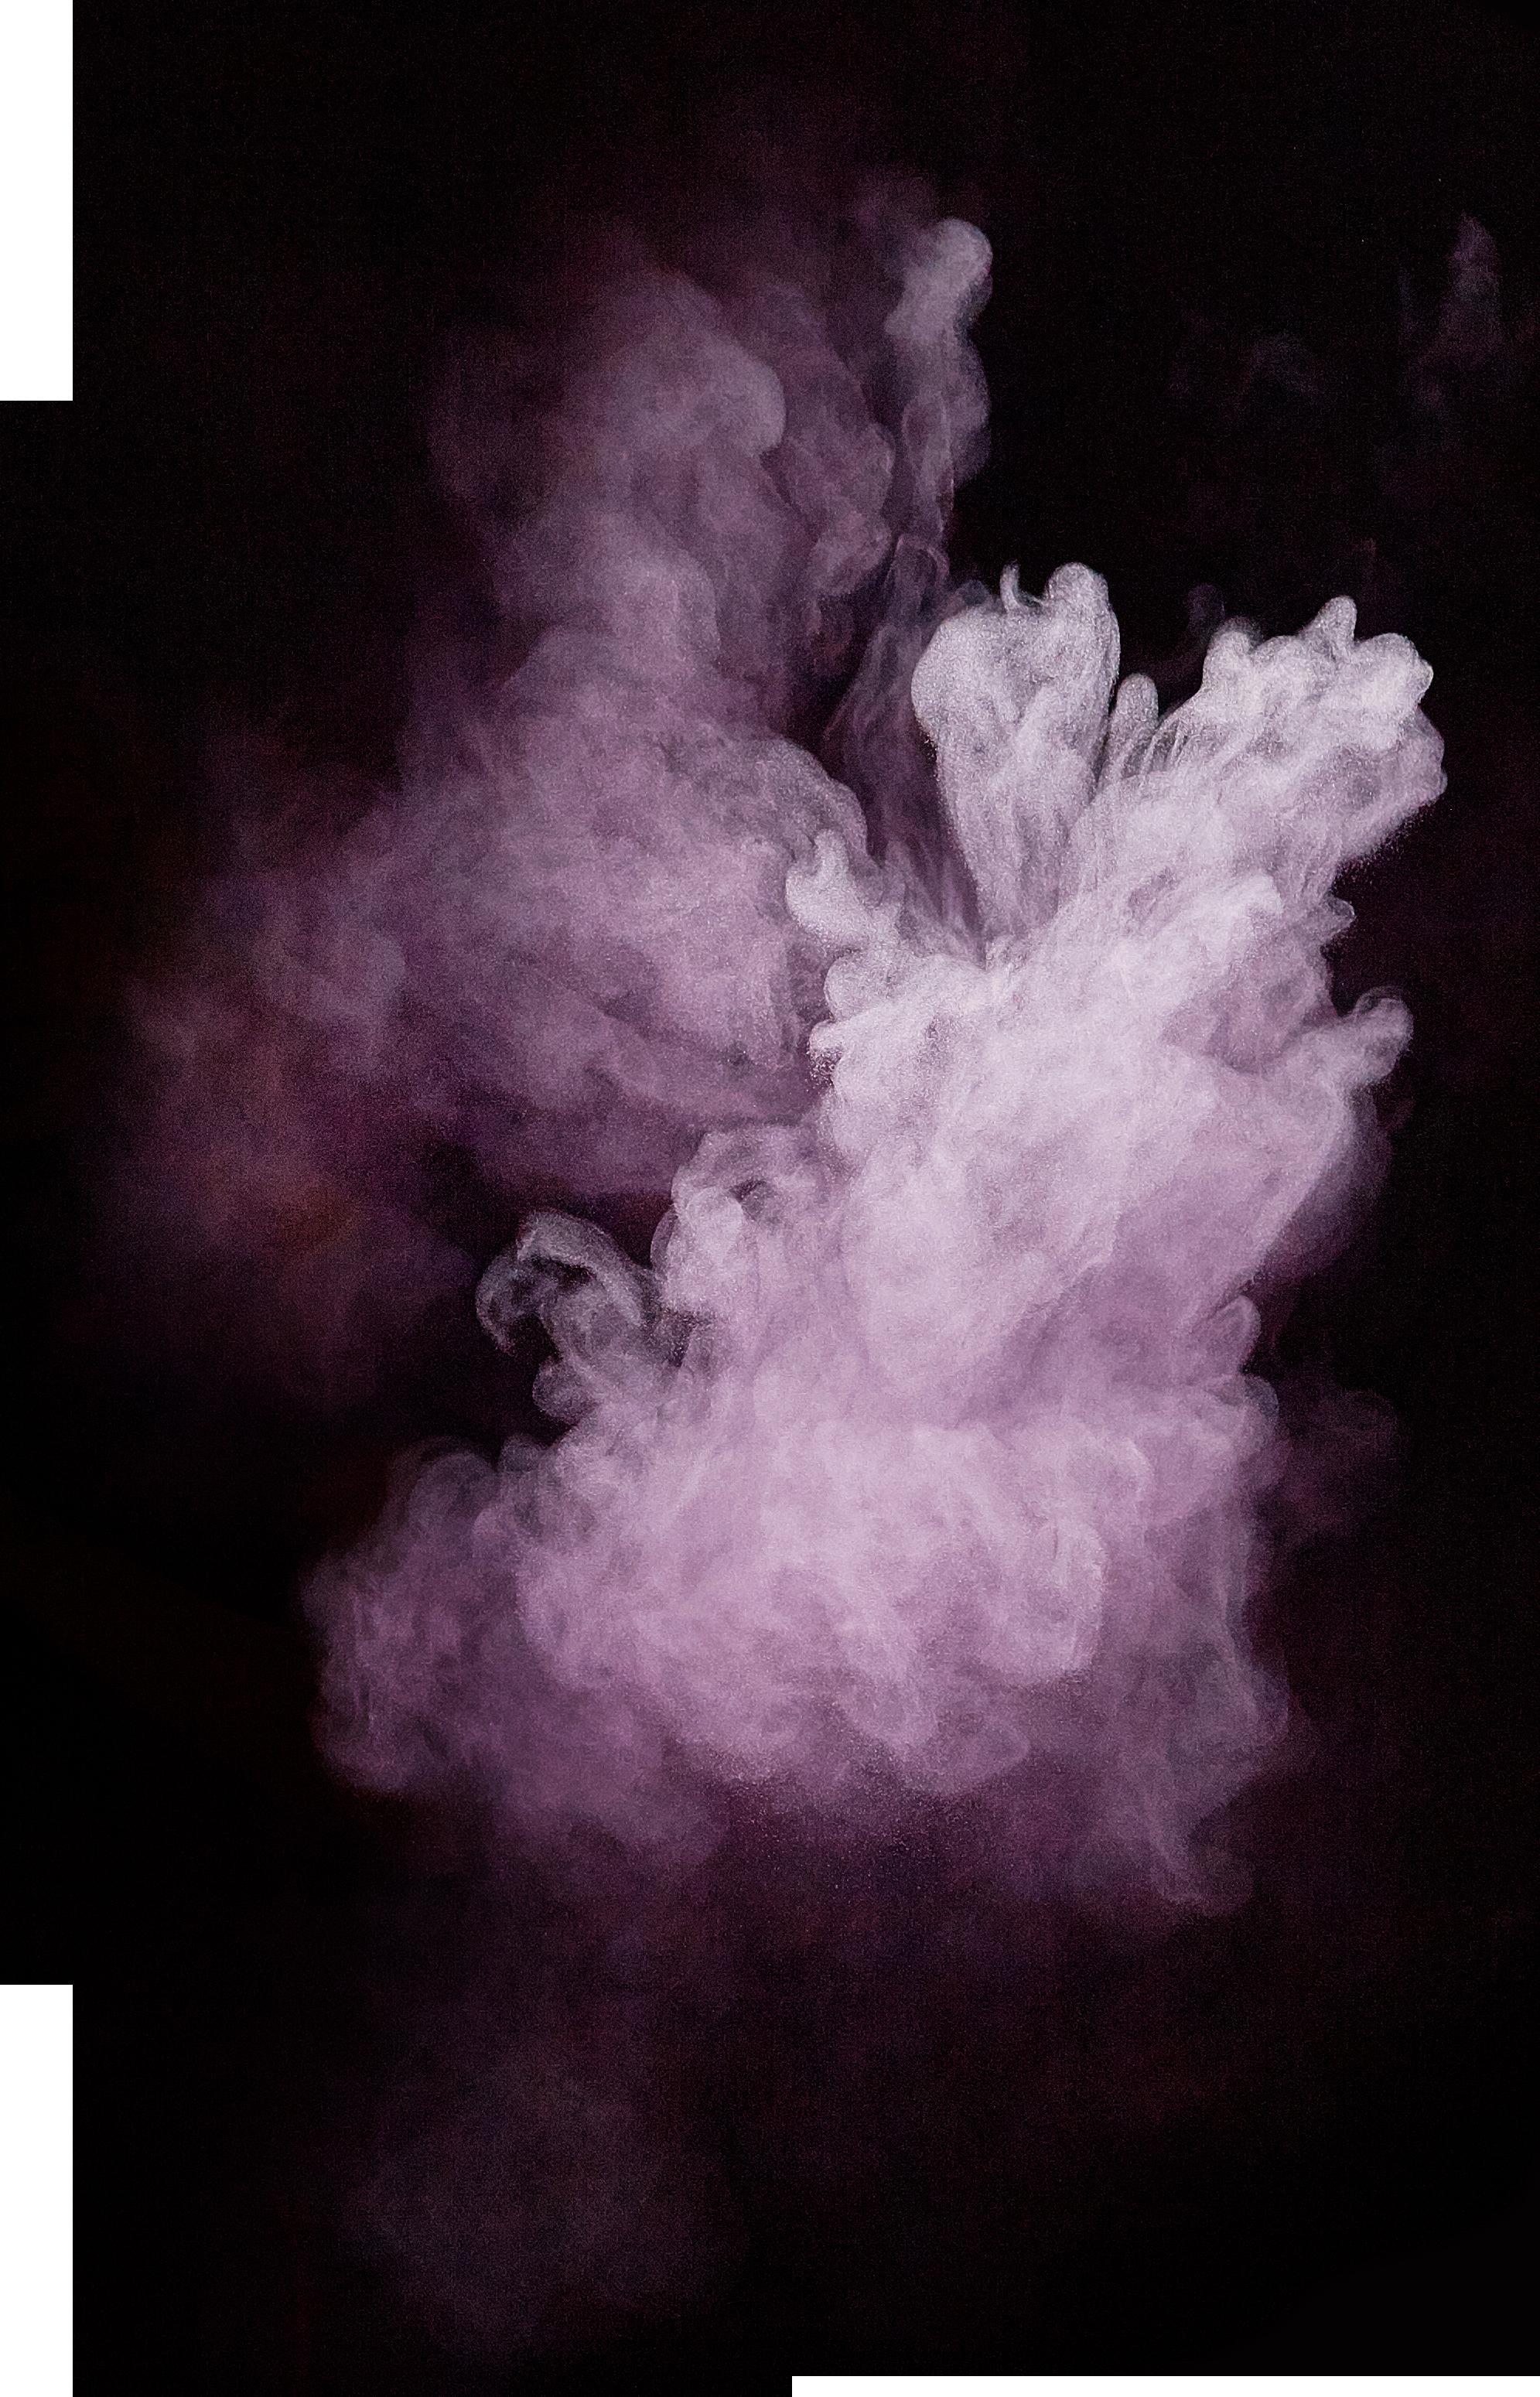 Purple Powder Explosion PNG Image.